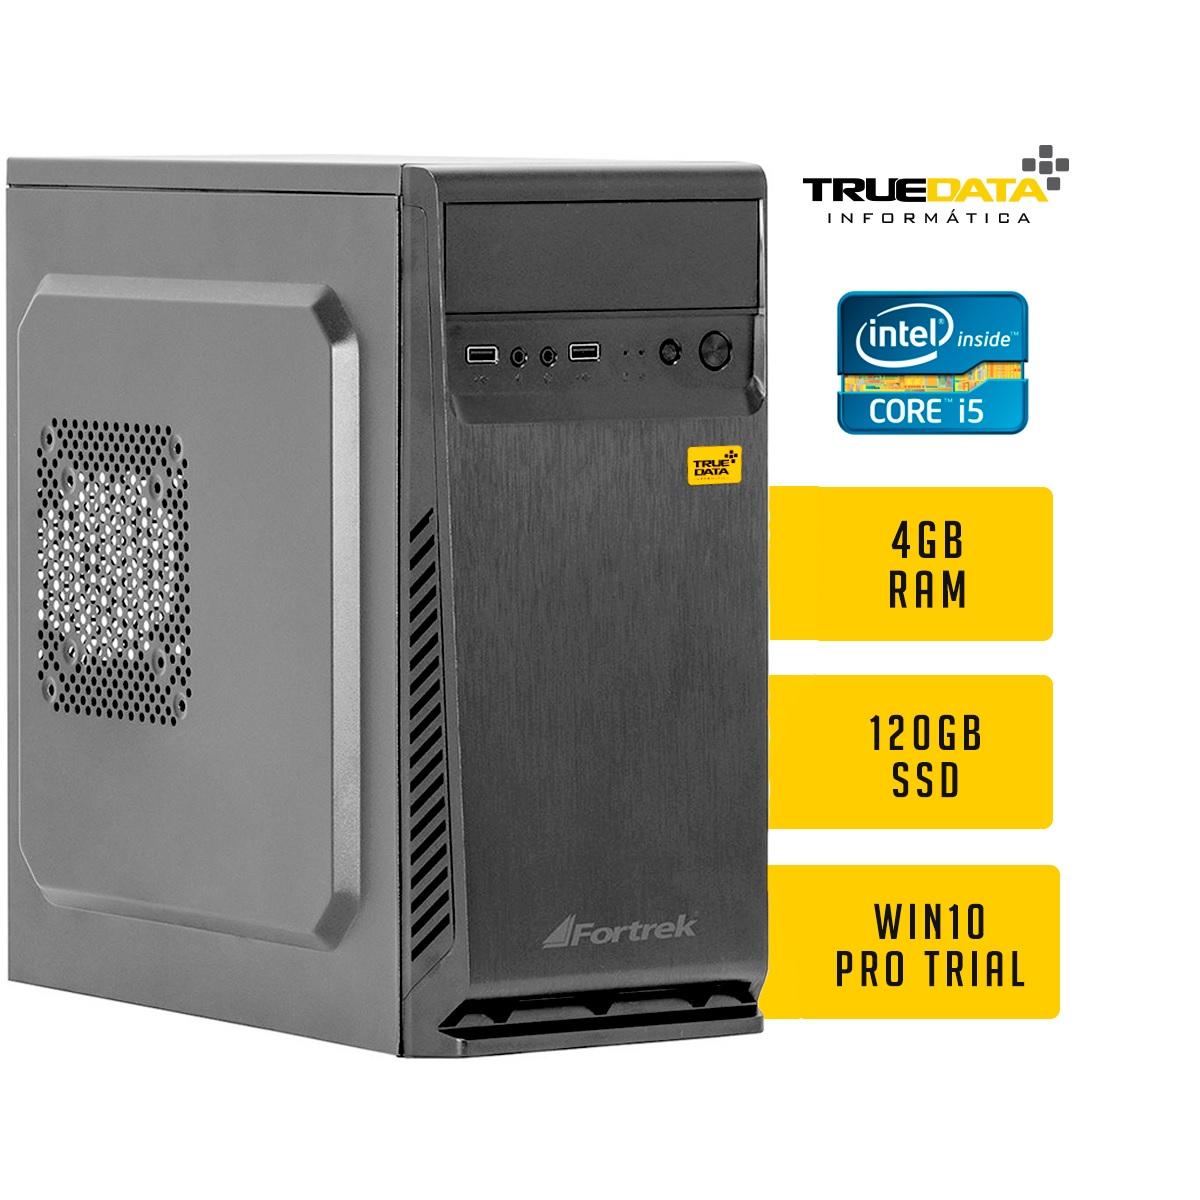 Computador Desktop True Data Intel Core I5-2500 3.7ghz 4gb Ssd 120gb  W10 Trial